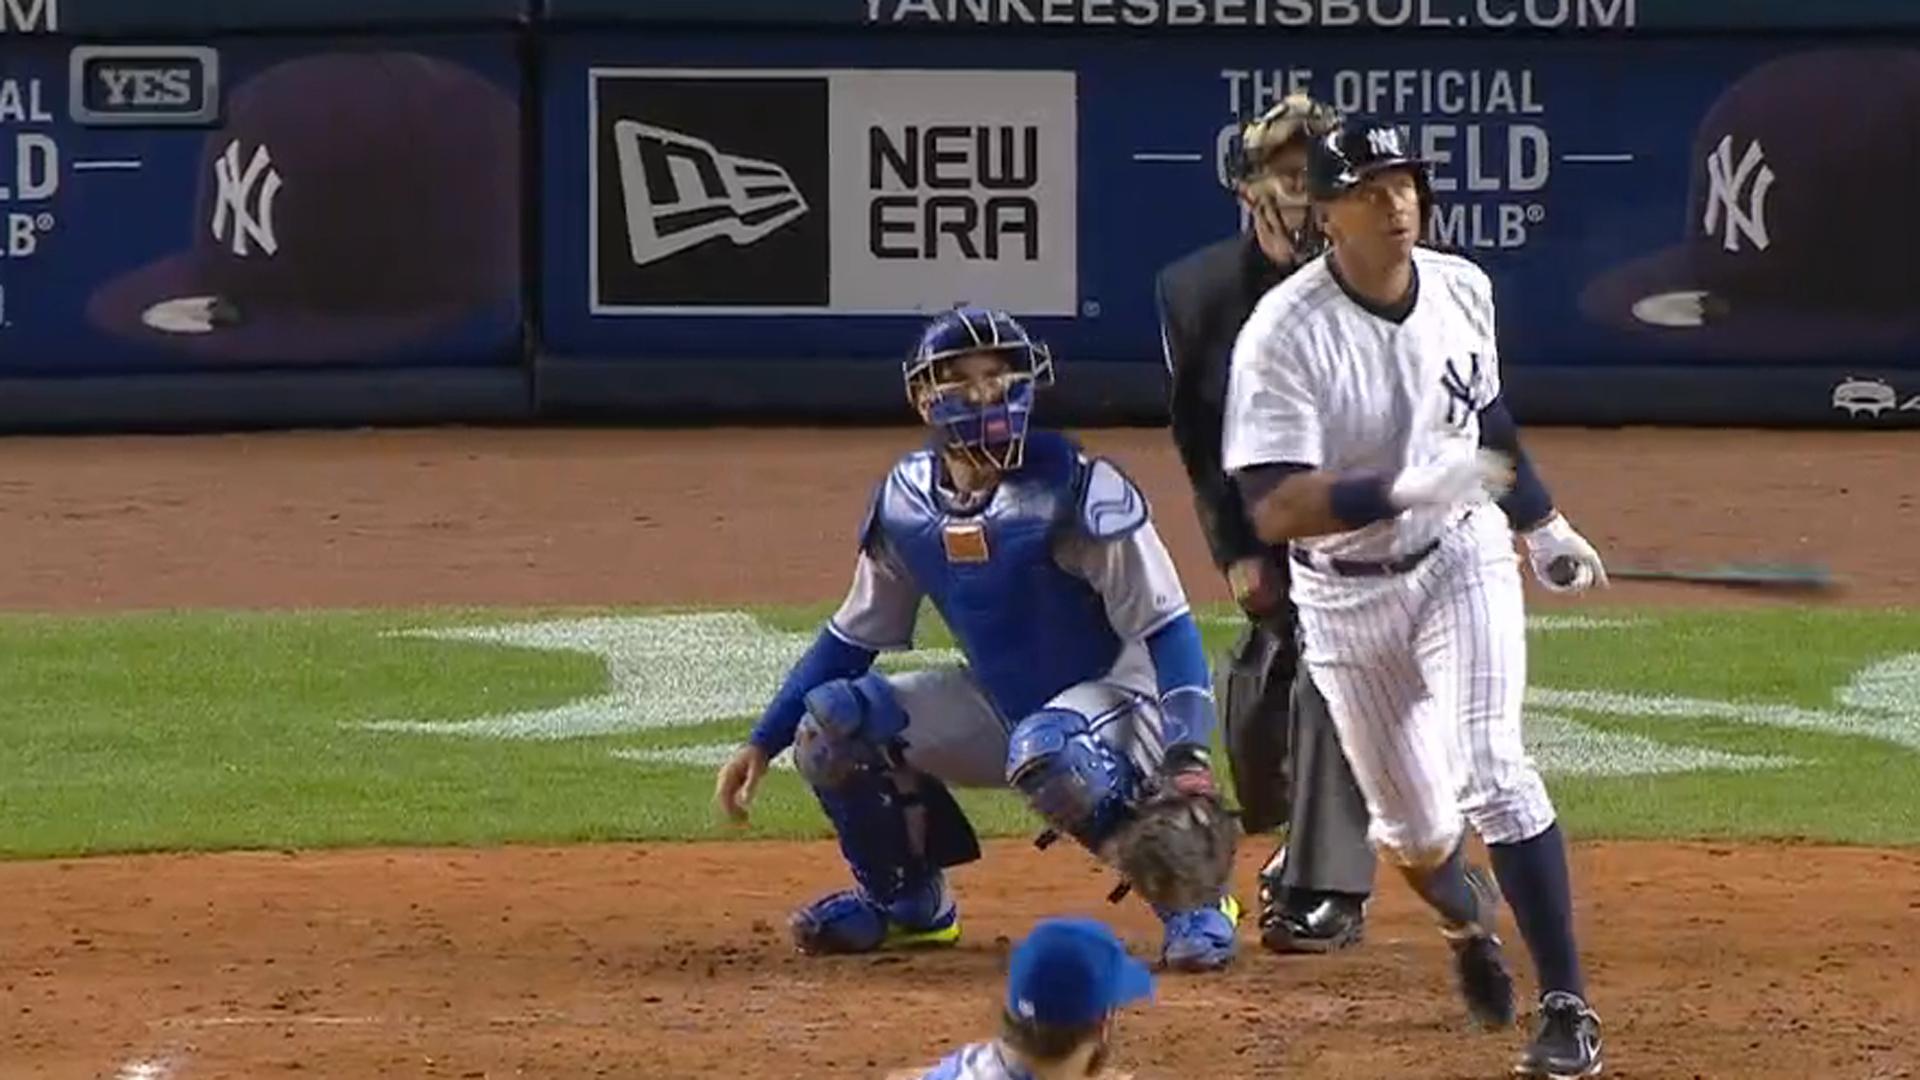 alex-rodriguez-hr-041015-MLB.com-ftr